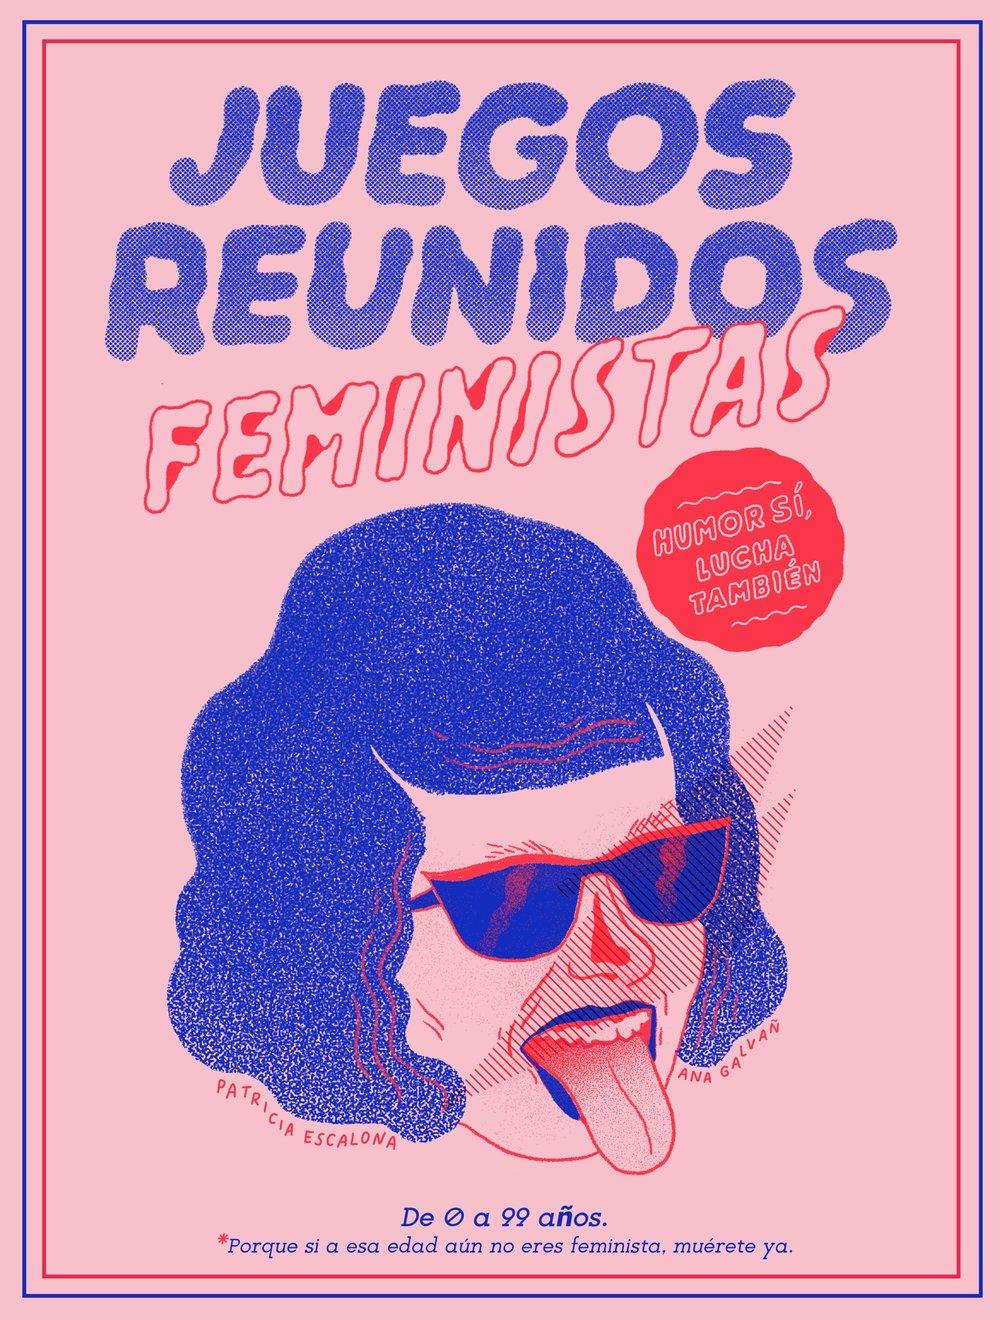 portada_juegos-reunidos-feministas_patricia-escalona_201812041248.jpg